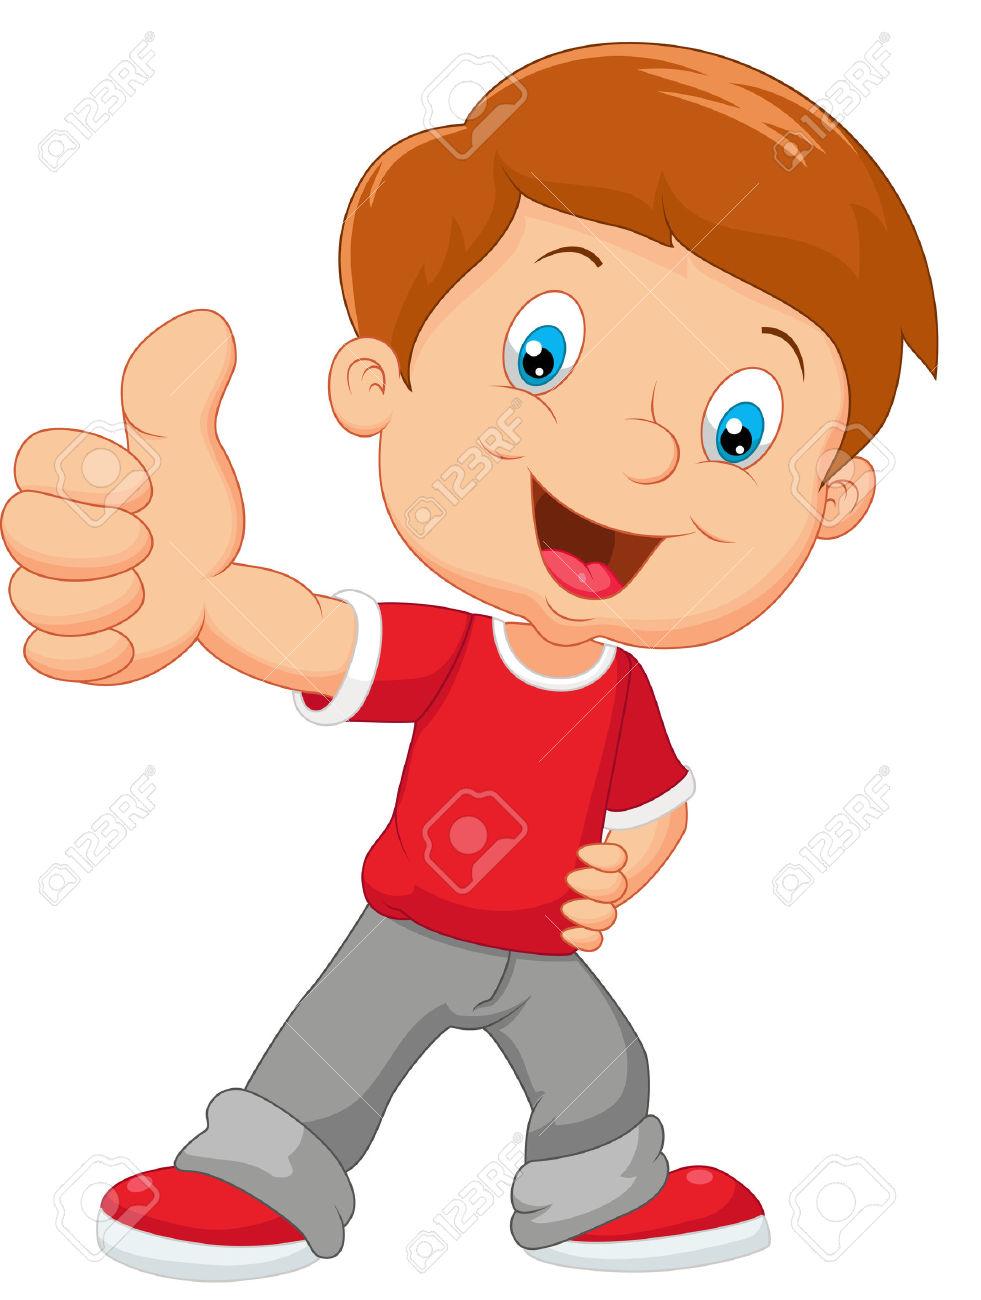 Boy thumbs up clipart clip art download Kid thumbs up clipart - ClipartFox clip art download